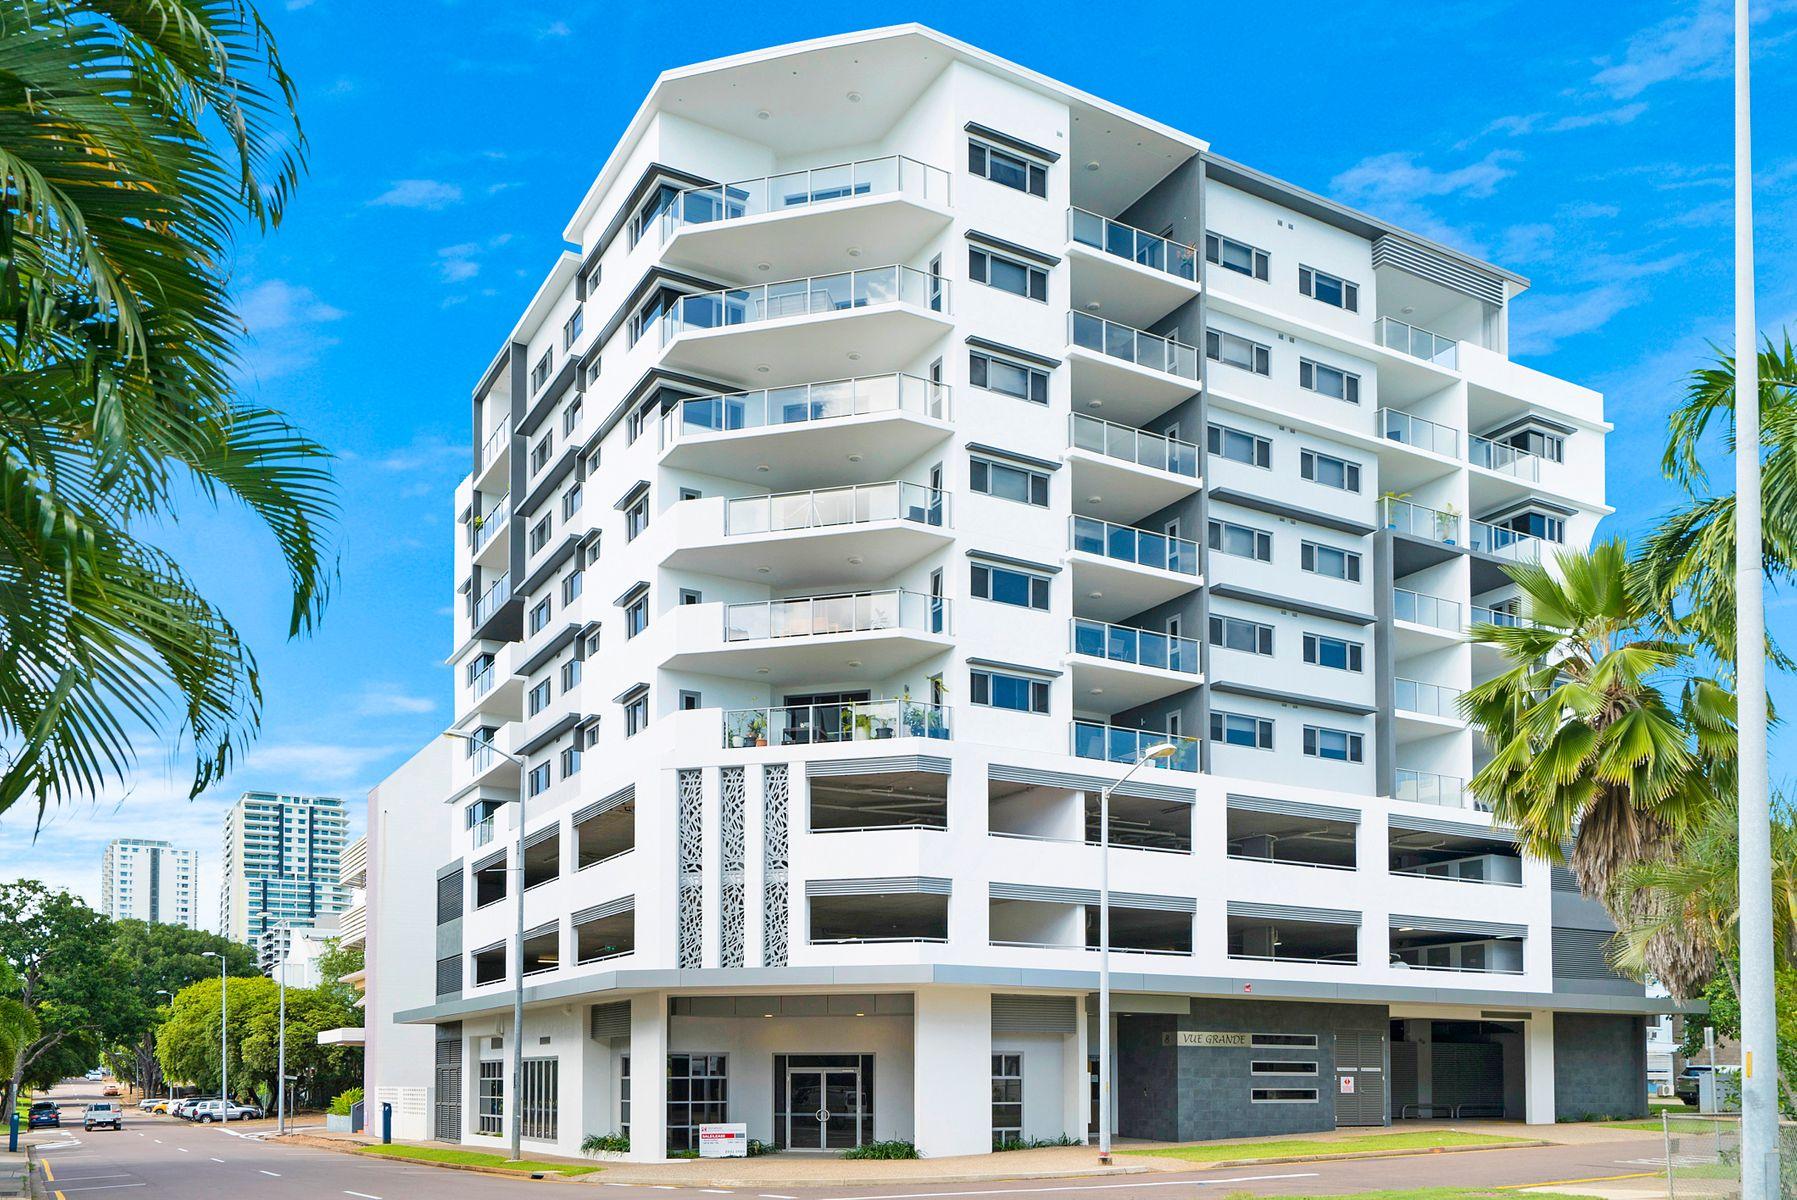 402/8 Shepherd Street, Darwin City, NT 0800